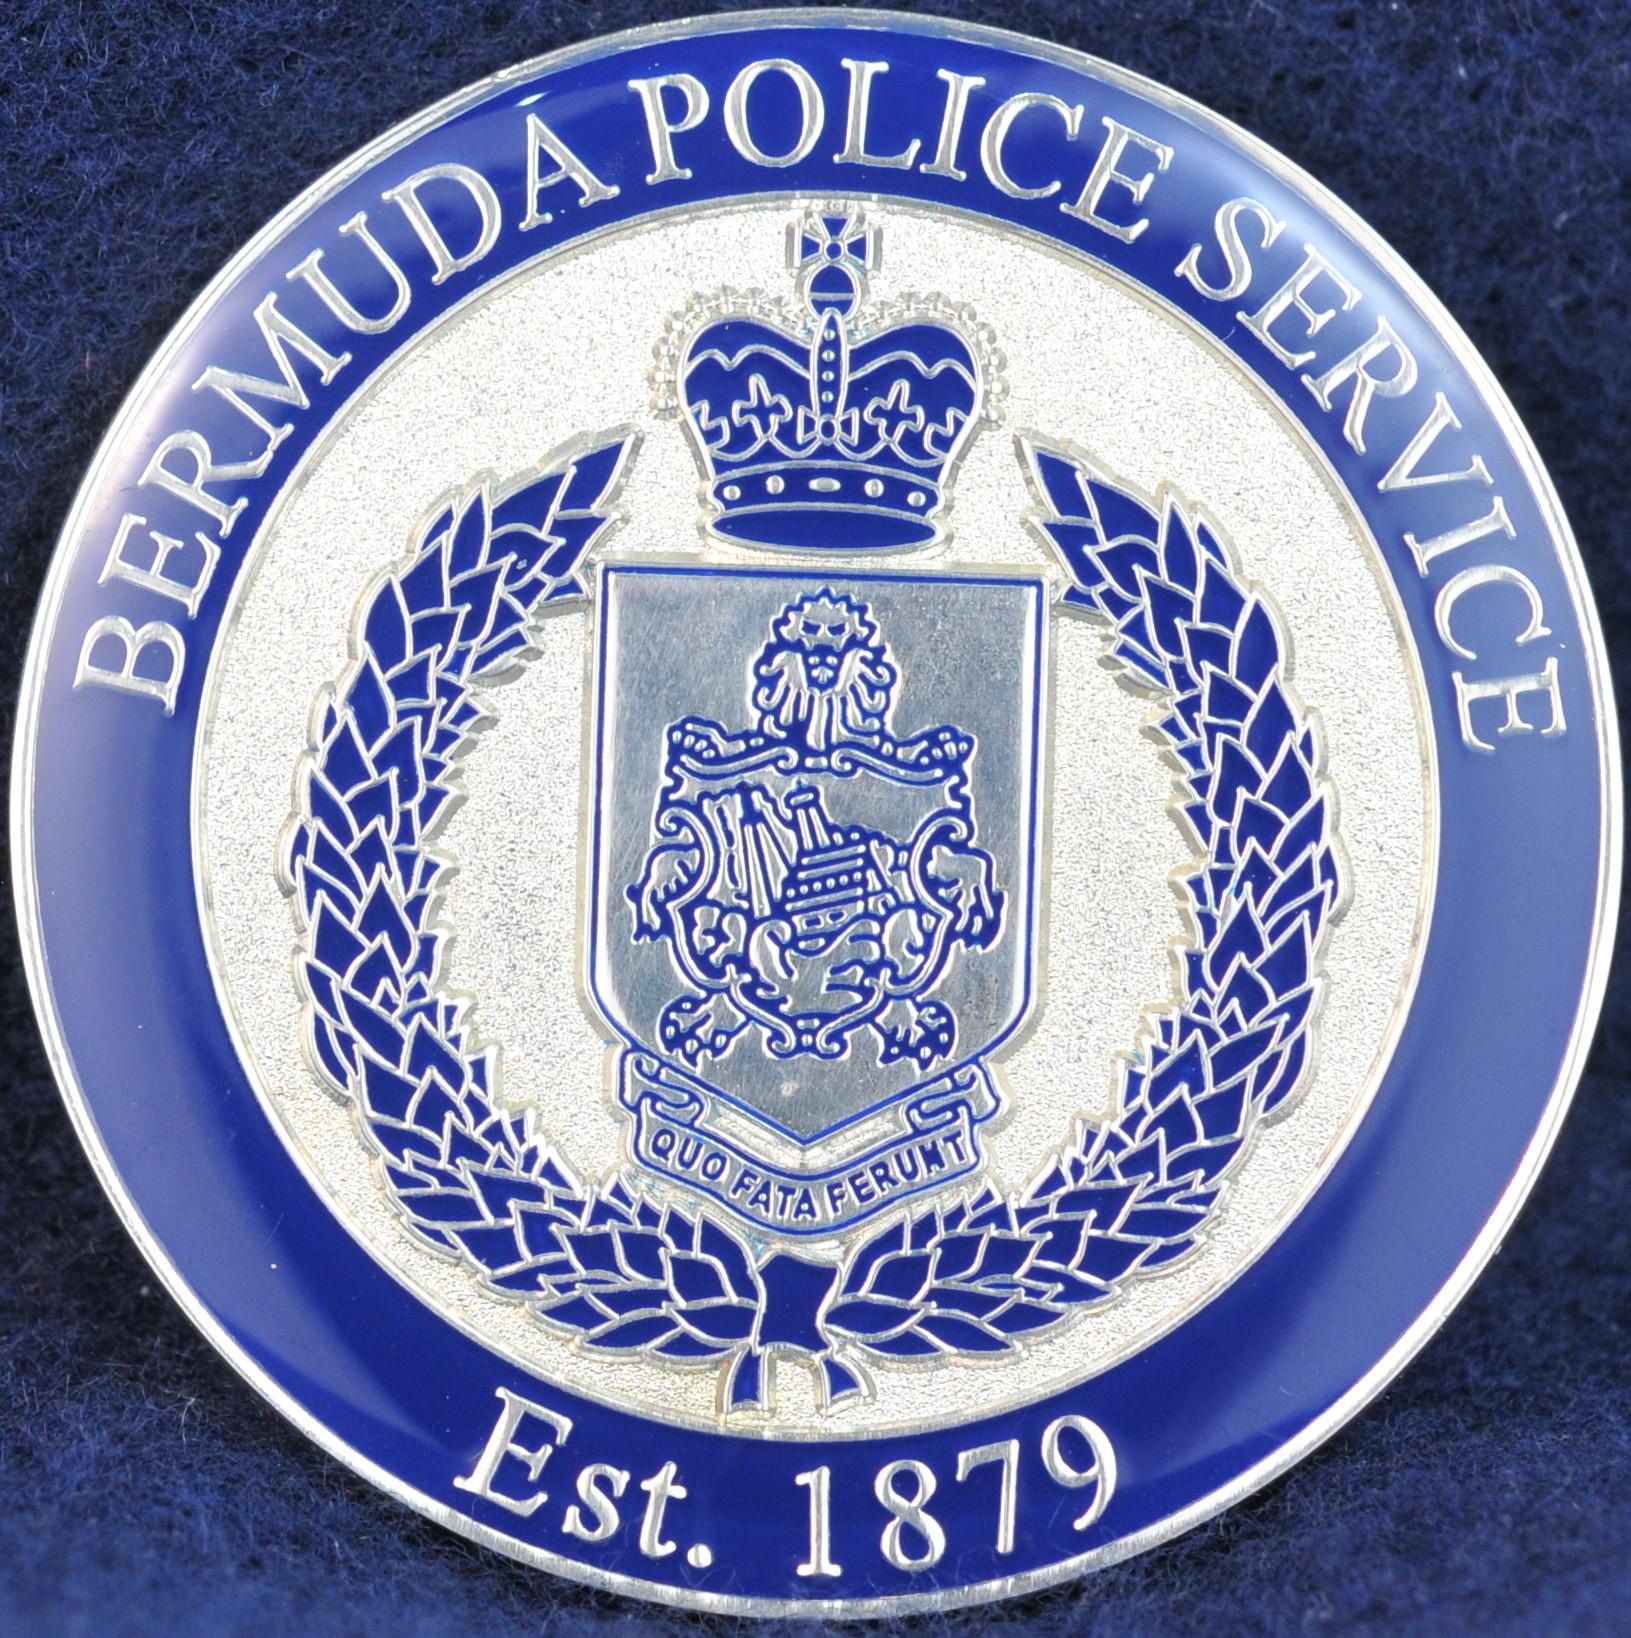 Bm forex bureau contact